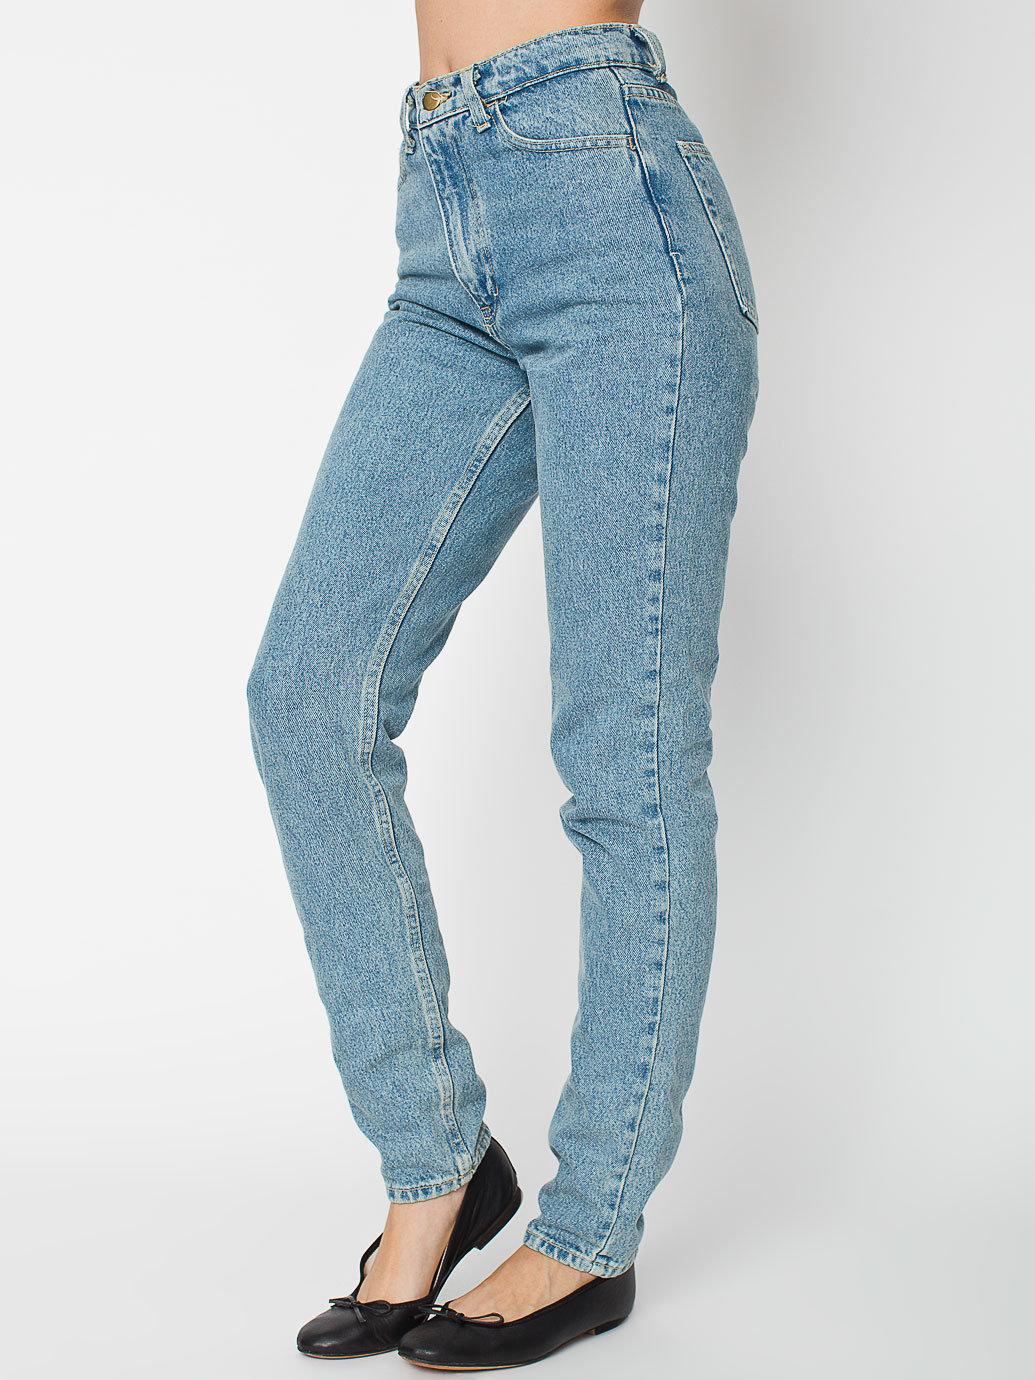 blue denim high waisted jeans - Jean Yu Beauty